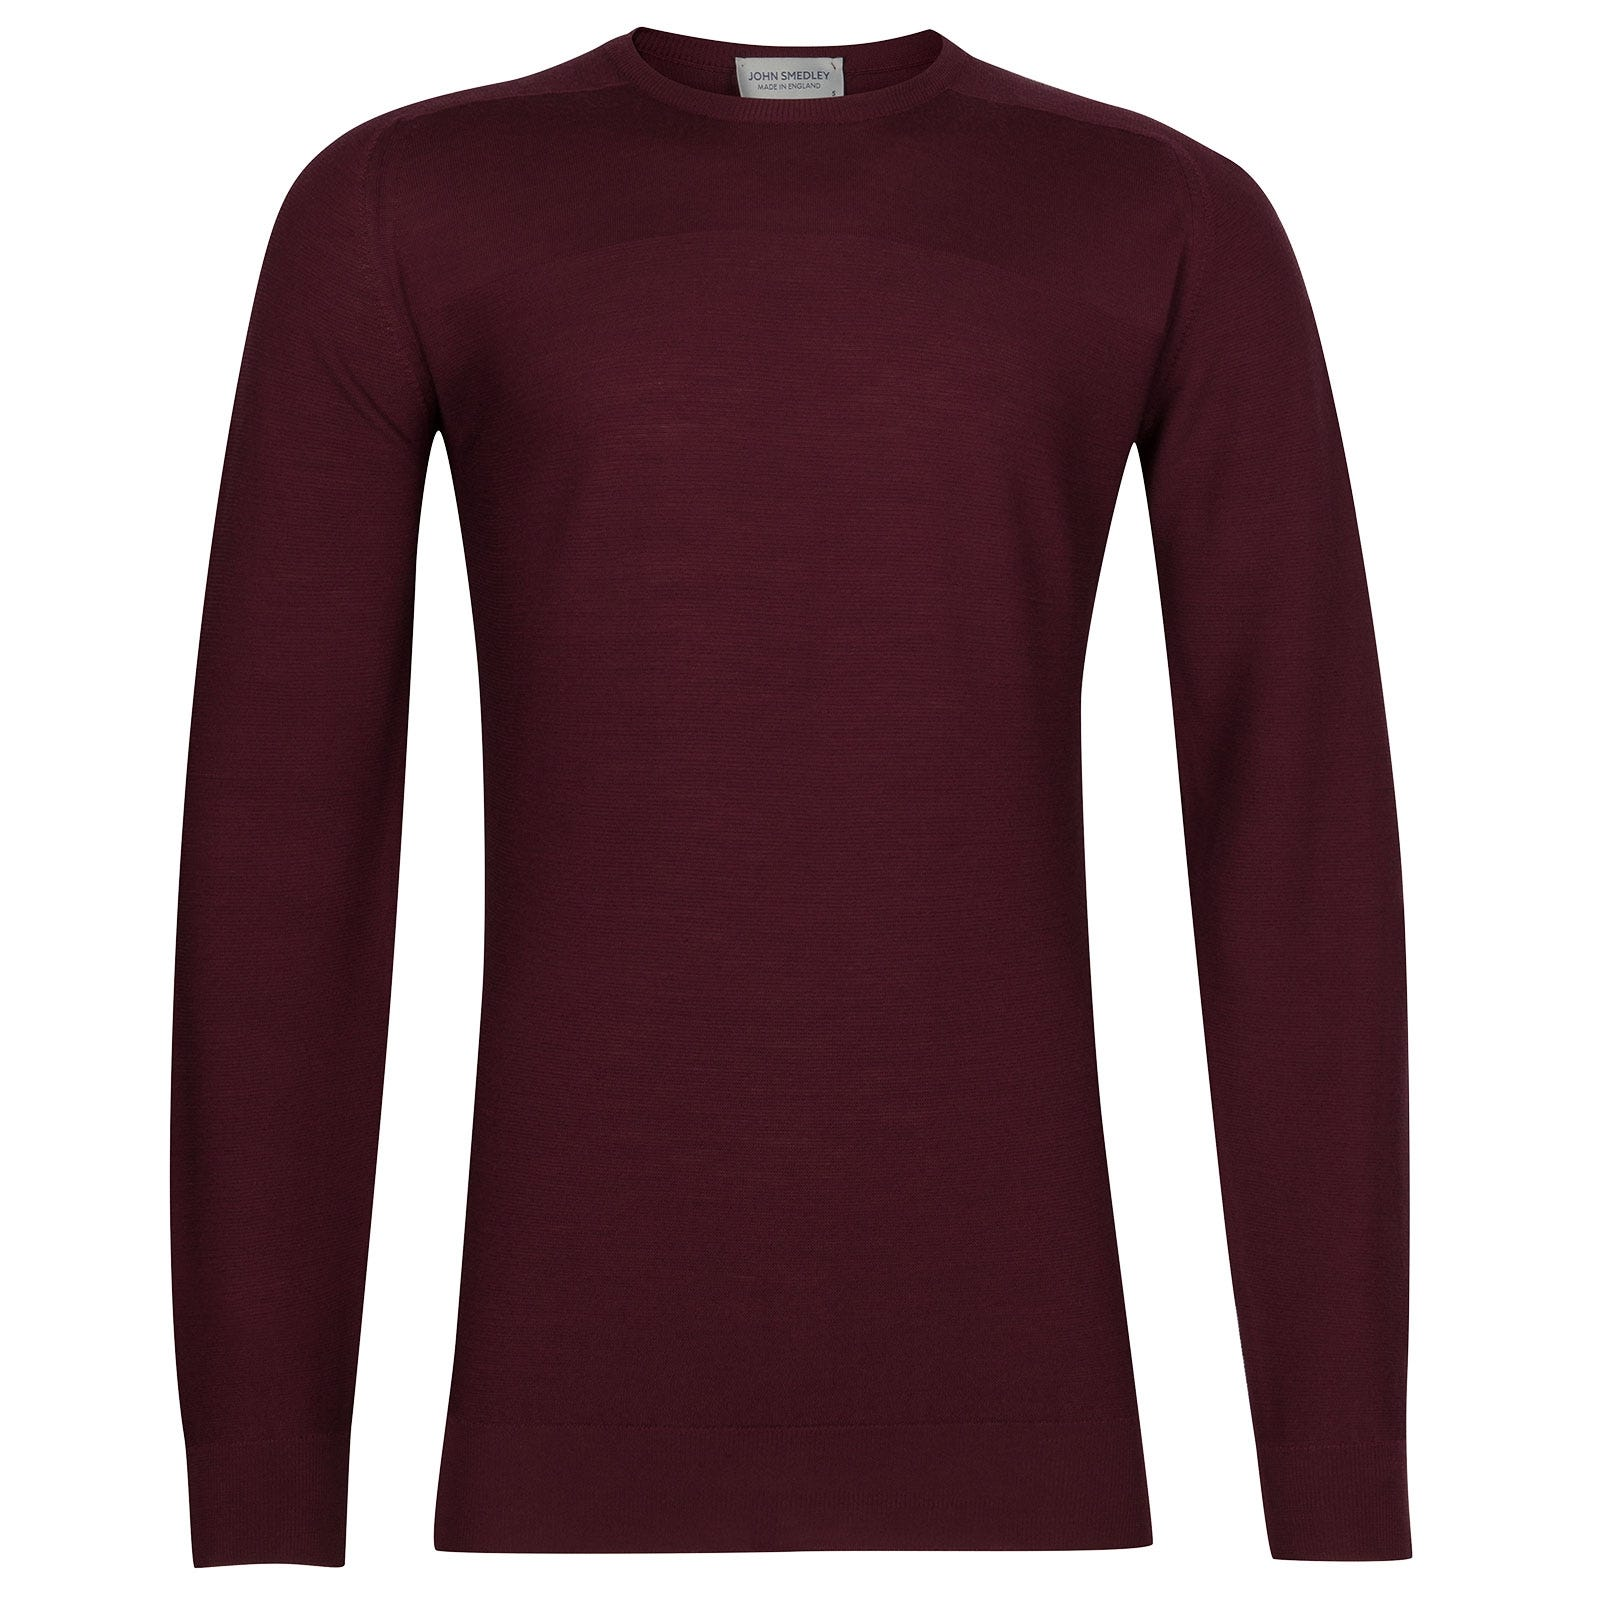 John Smedley Dash Extra Fine Merino Pullover in Bordeaux-XL